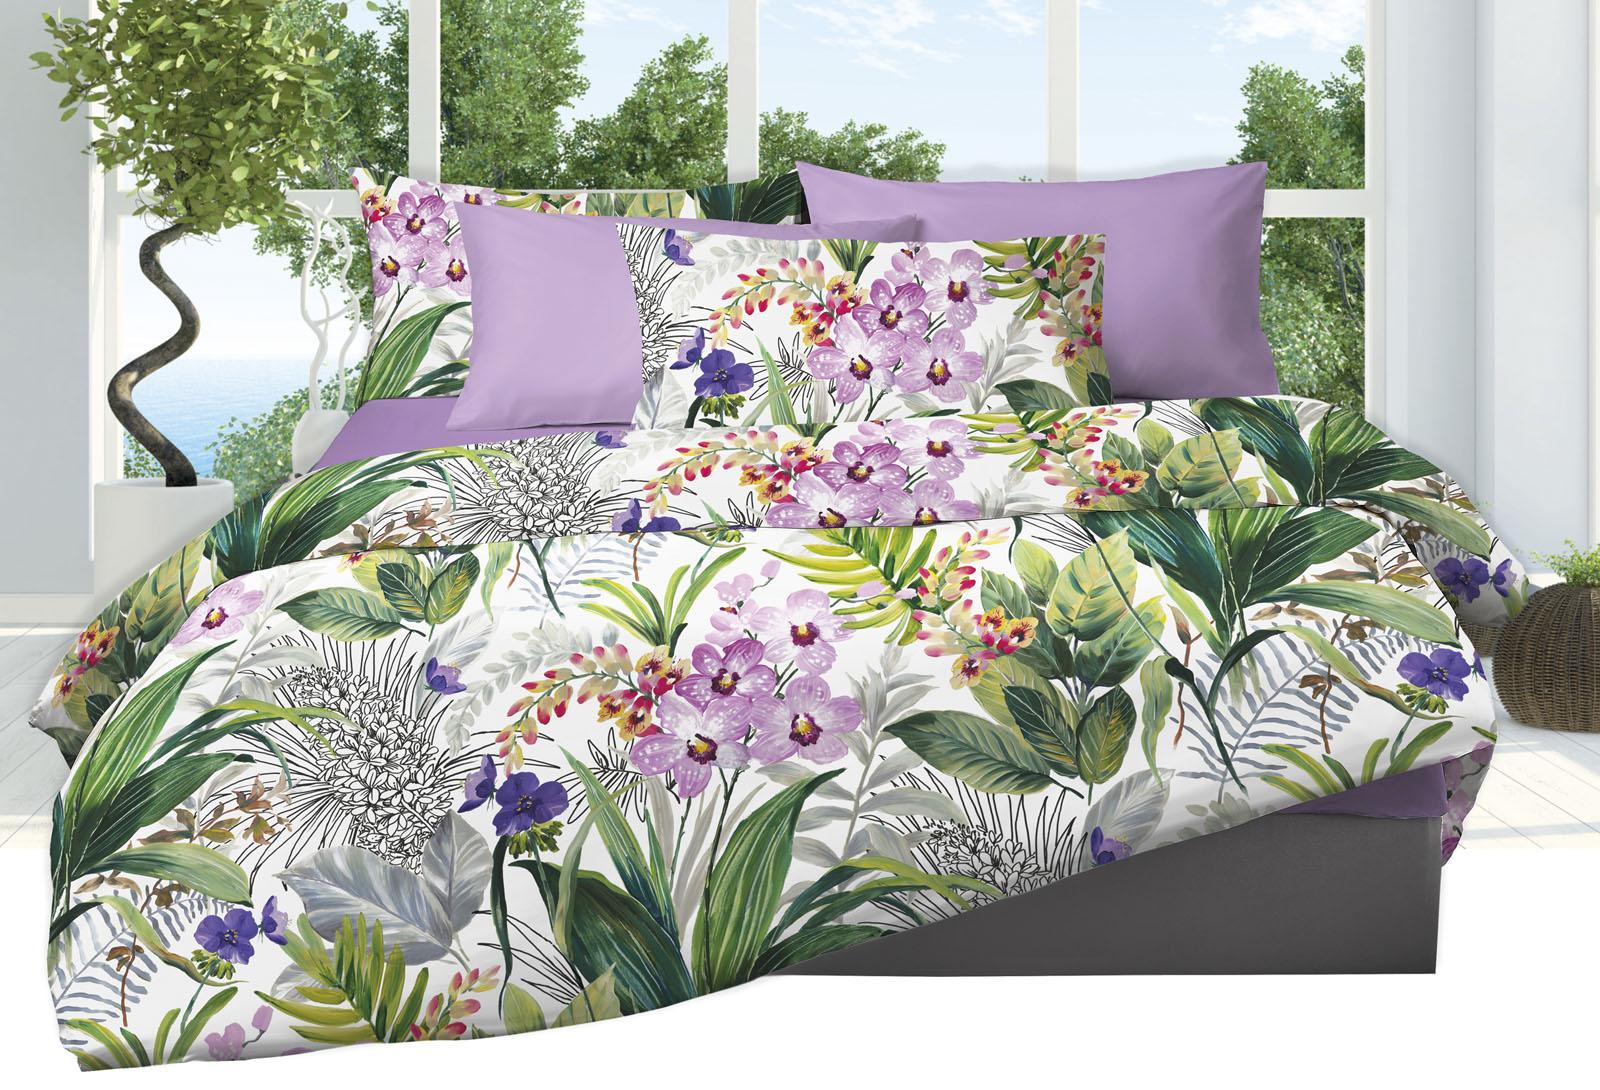 Lenzuola Matrimoniali Fiori.Lenzuola Matrimoniali Fiori Orchid Familia Service